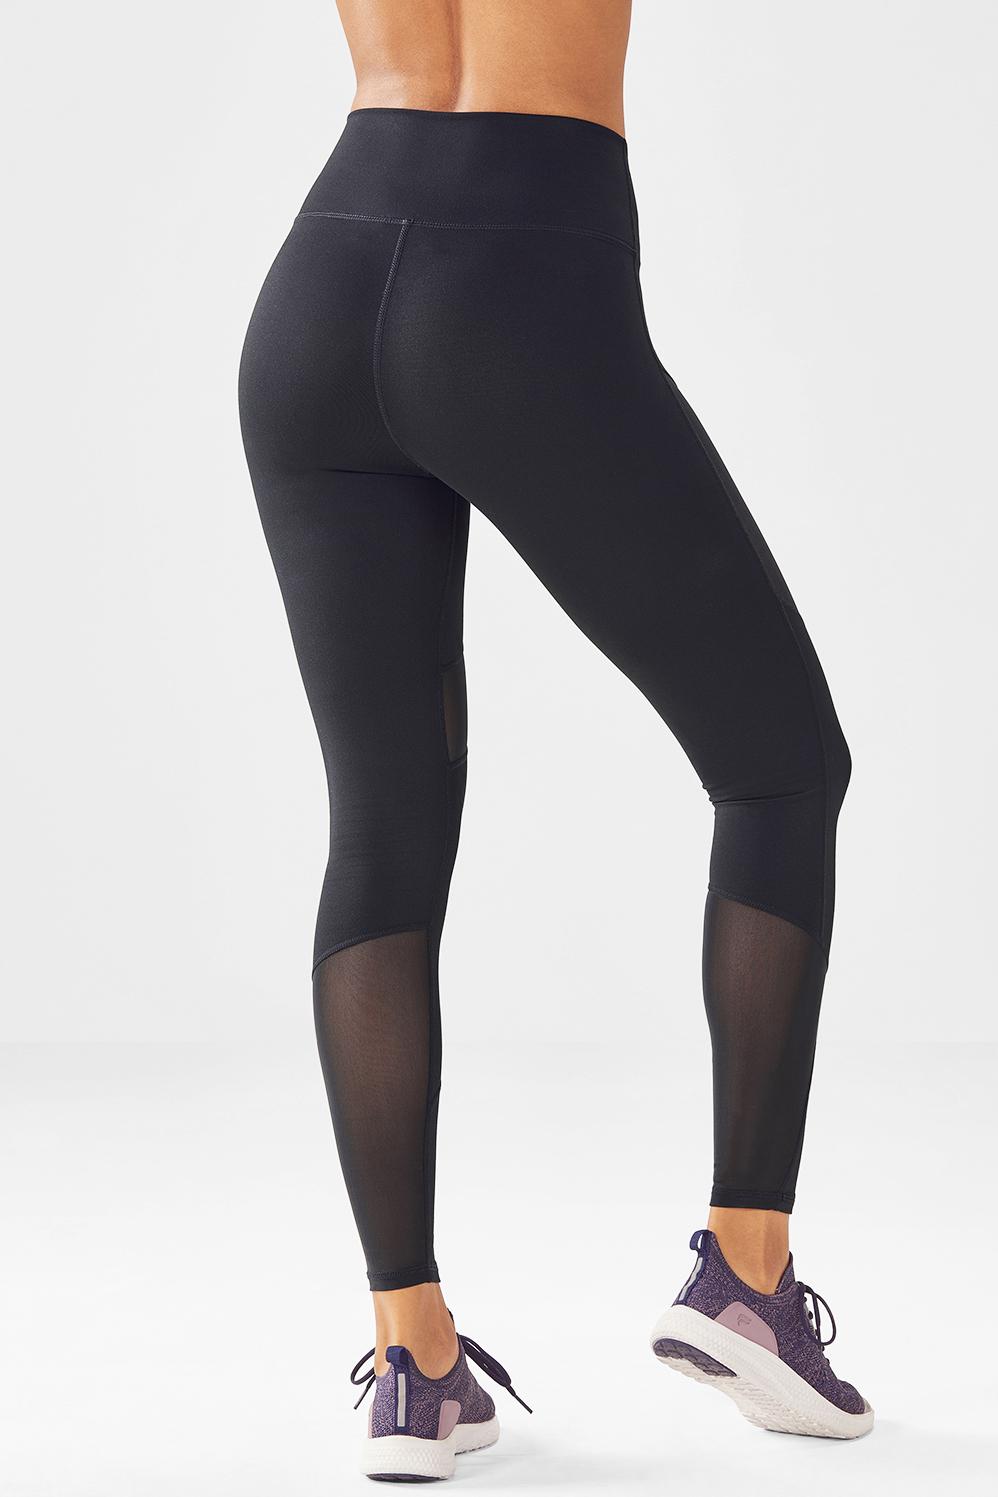 9e6bb38bd7d57 High-Waisted Mesh PowerHold® Legging - Fabletics